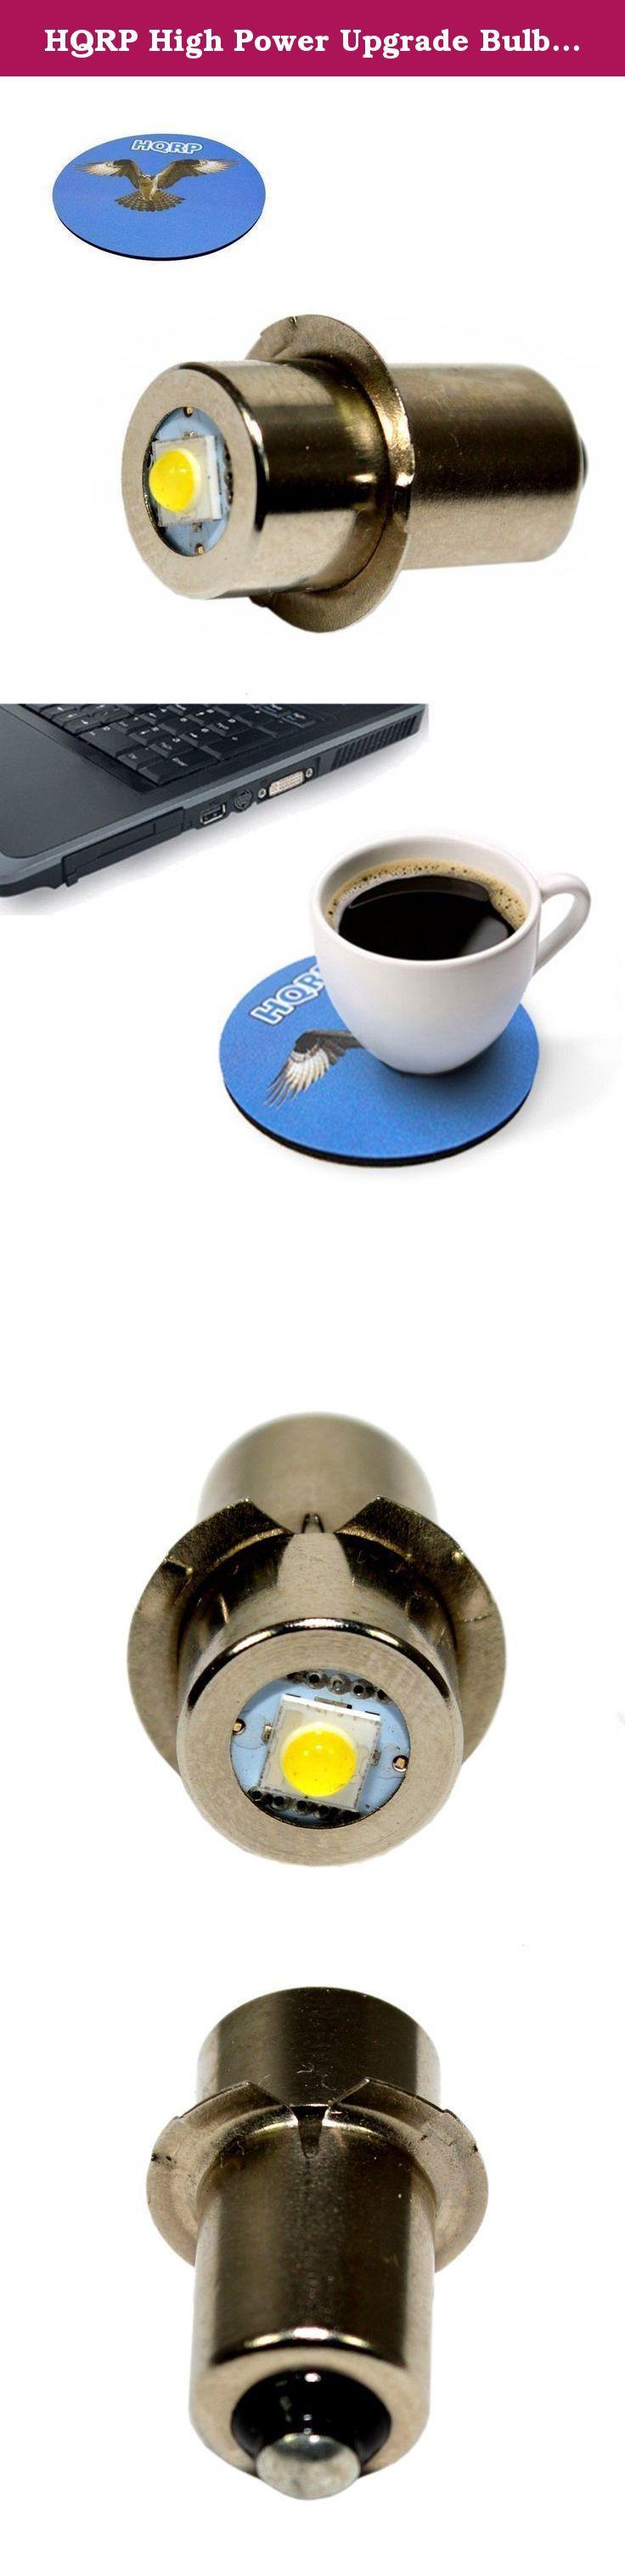 HQRP High Power Upgrade Bulb 3W LED 100LM for 12 14.4 18 Volt Hitachi Ryobi Skil Makita Craftsman Bosch Porter Cable Dewalt Milwaukee Ridgid Flashlight + HQRP Coaster. Compatible with: 12 14.4 18 Volt Hitachi Ryobi Skil Makita Craftsman Bosch Porter Cable Dewalt Milwaukee Ridgid Flashlight.